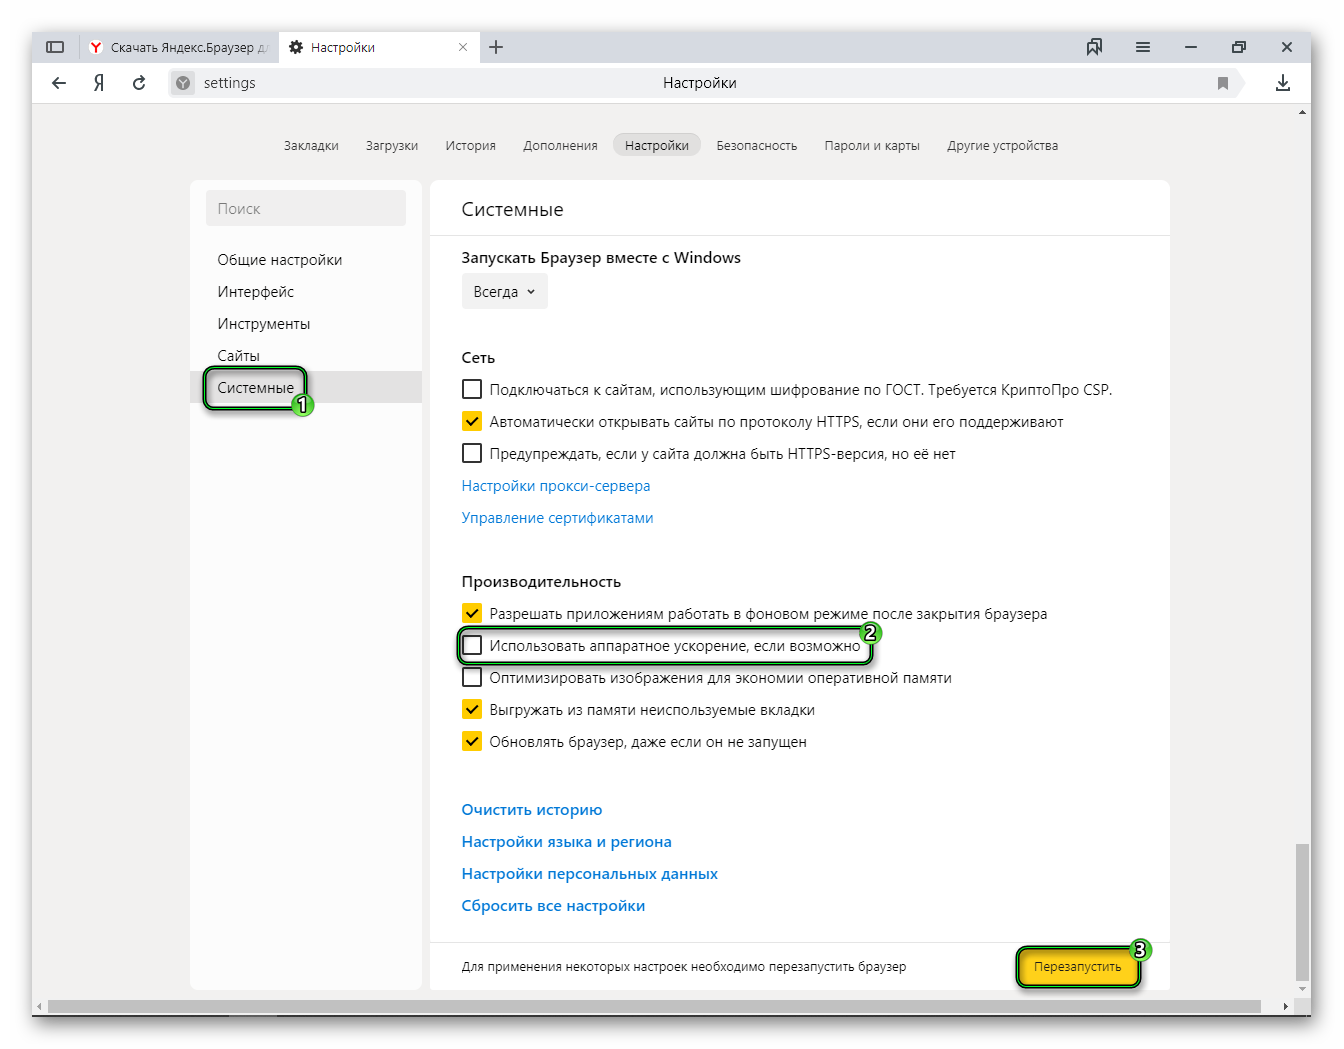 Отключение функции аппаратного ускорения в настройках Яндекс.Браузера